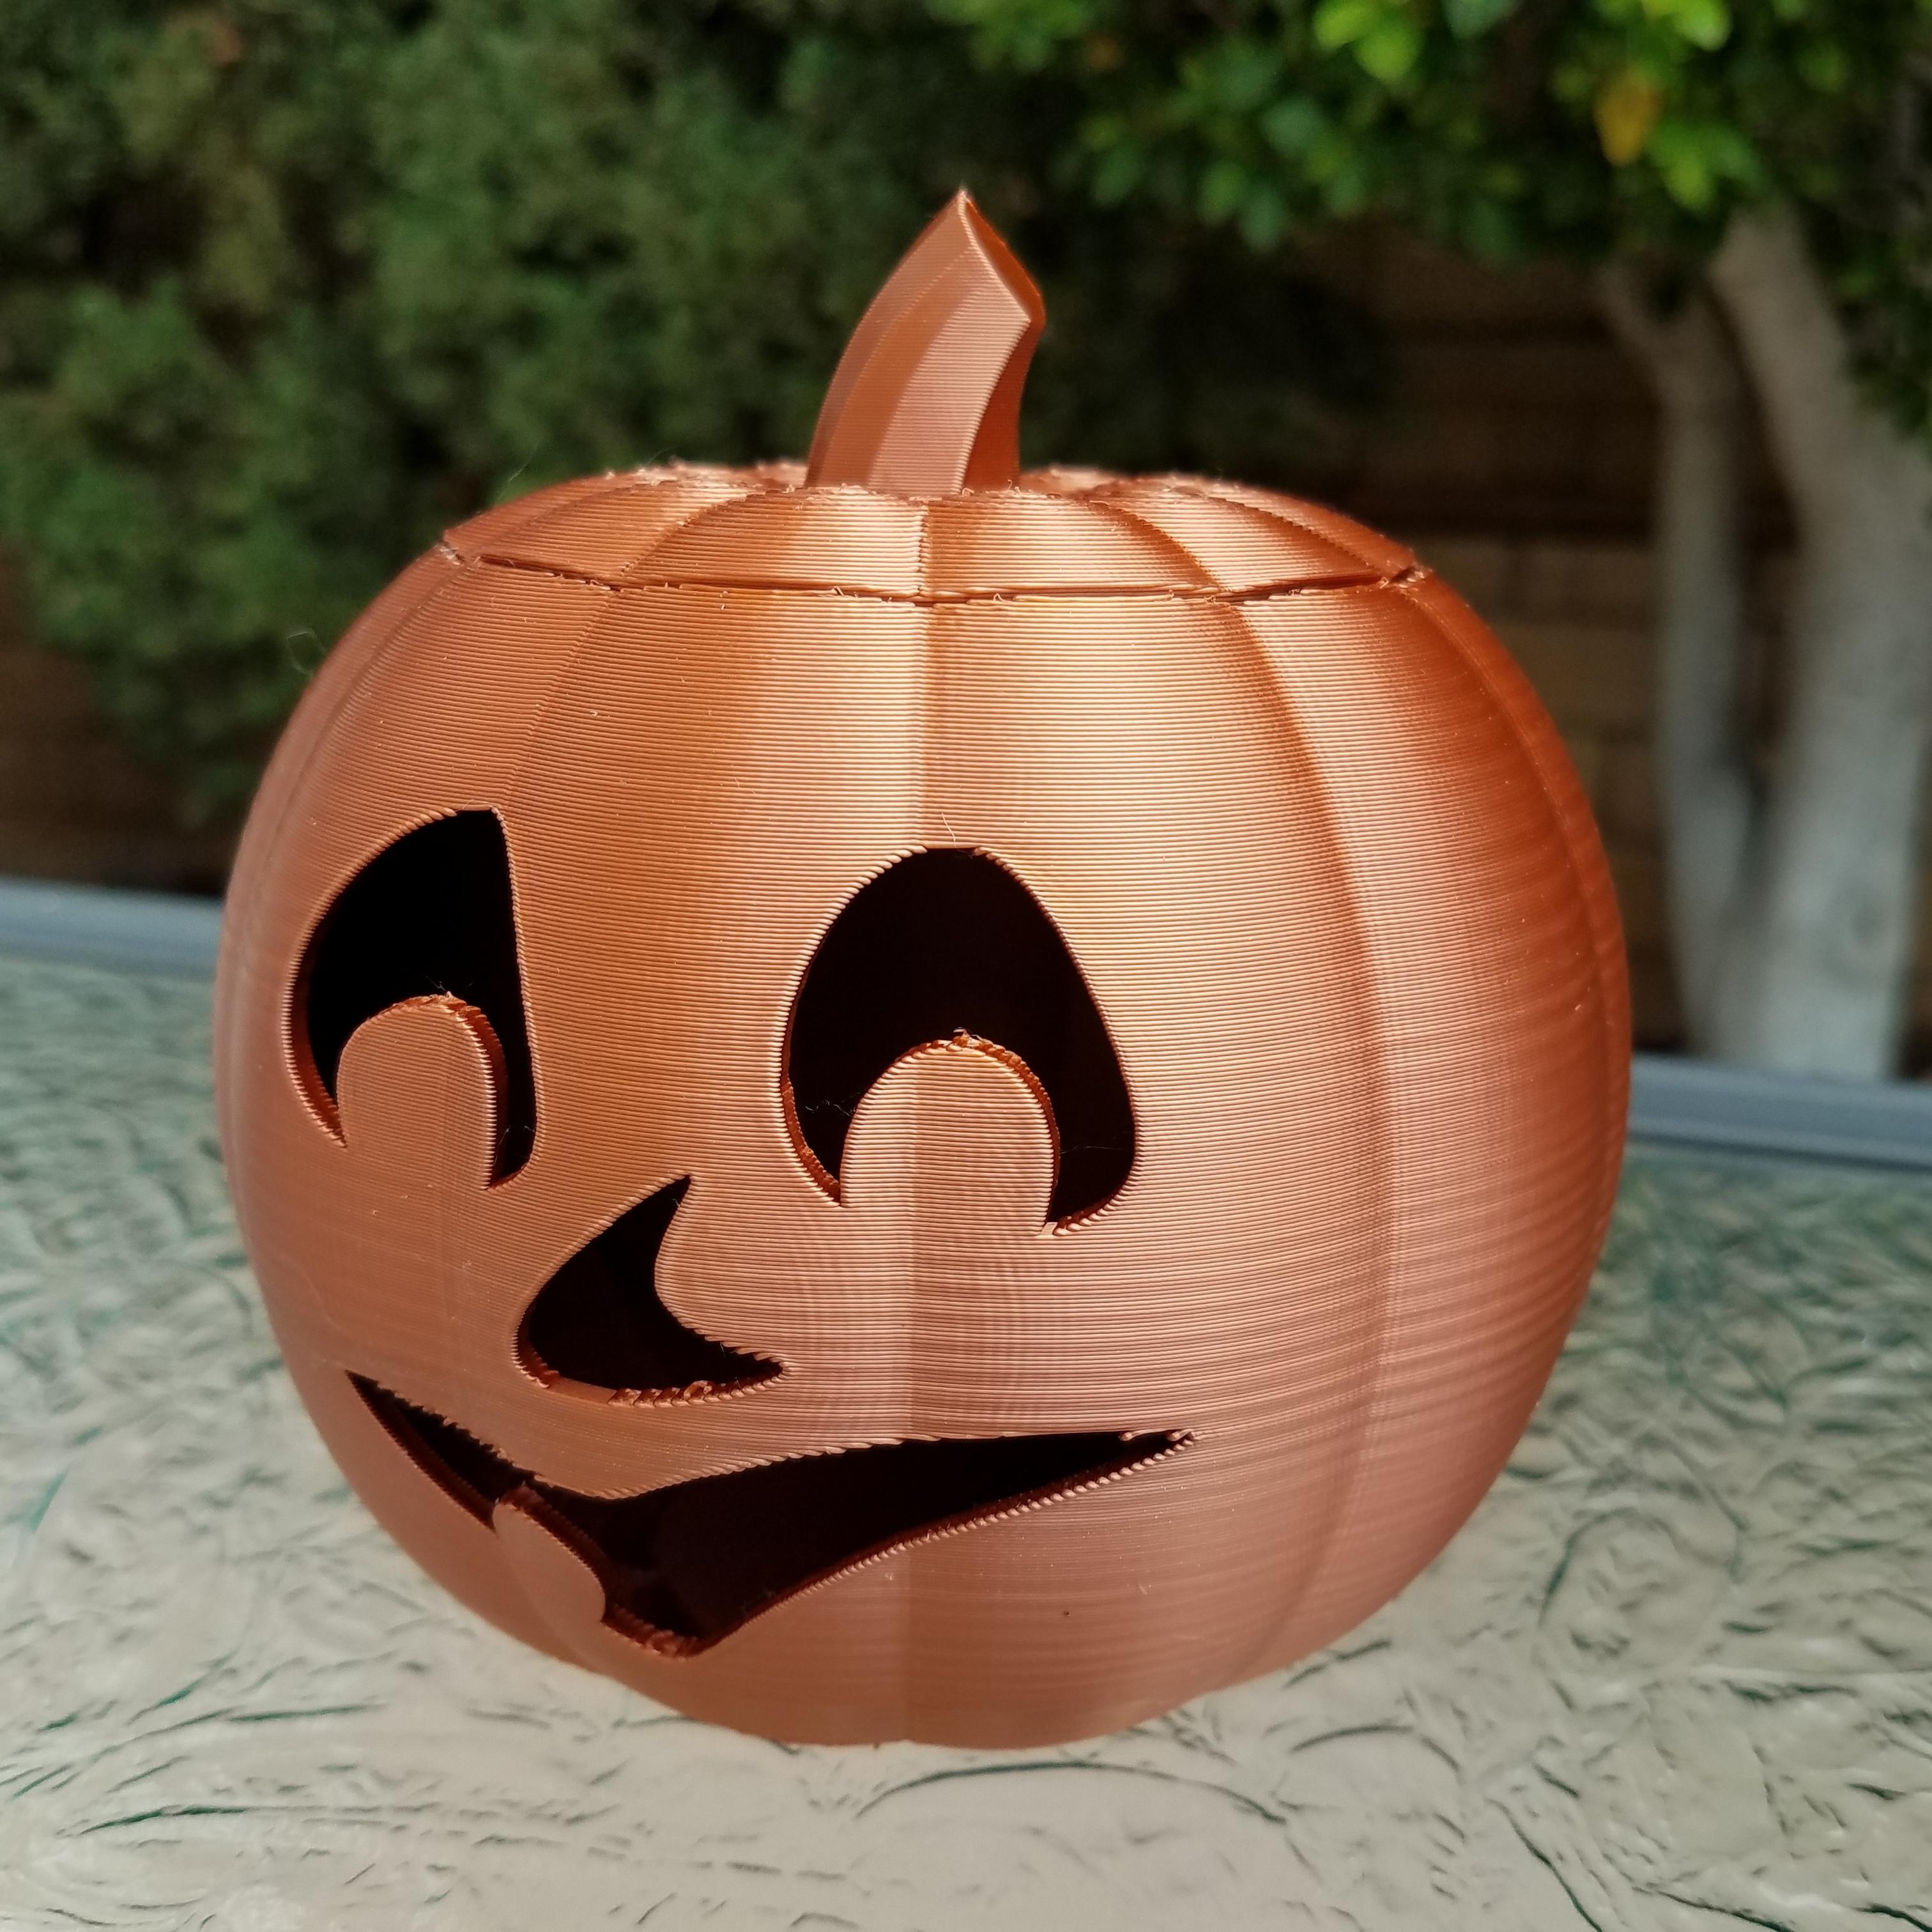 20201022_102113.jpg Download STL file Jack-O'-Lantern Smile Face • 3D printer design, abbymath